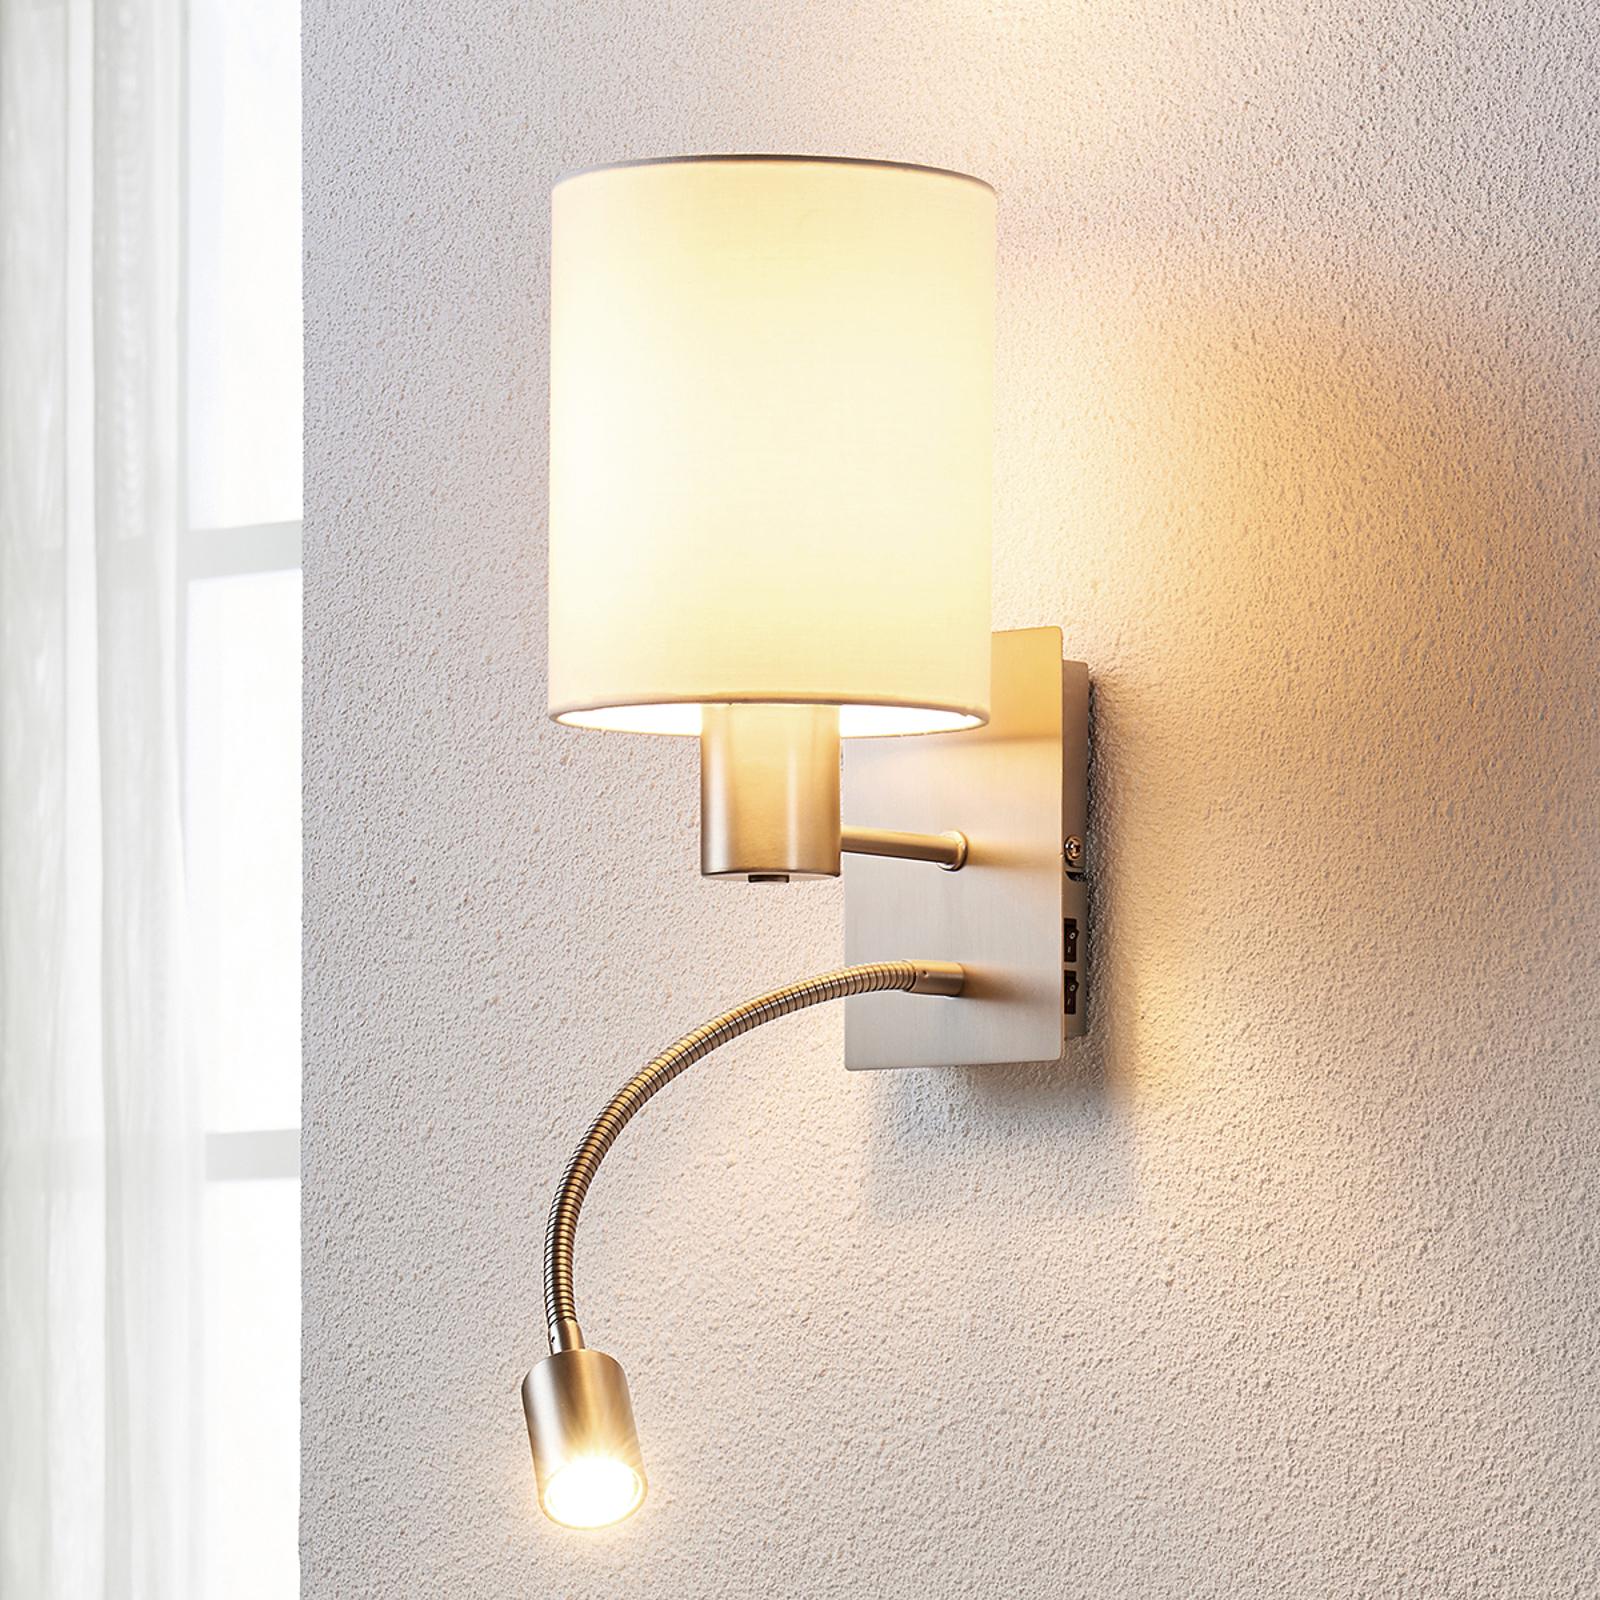 Stoffen wandlamp Shajan met LED leeslamp